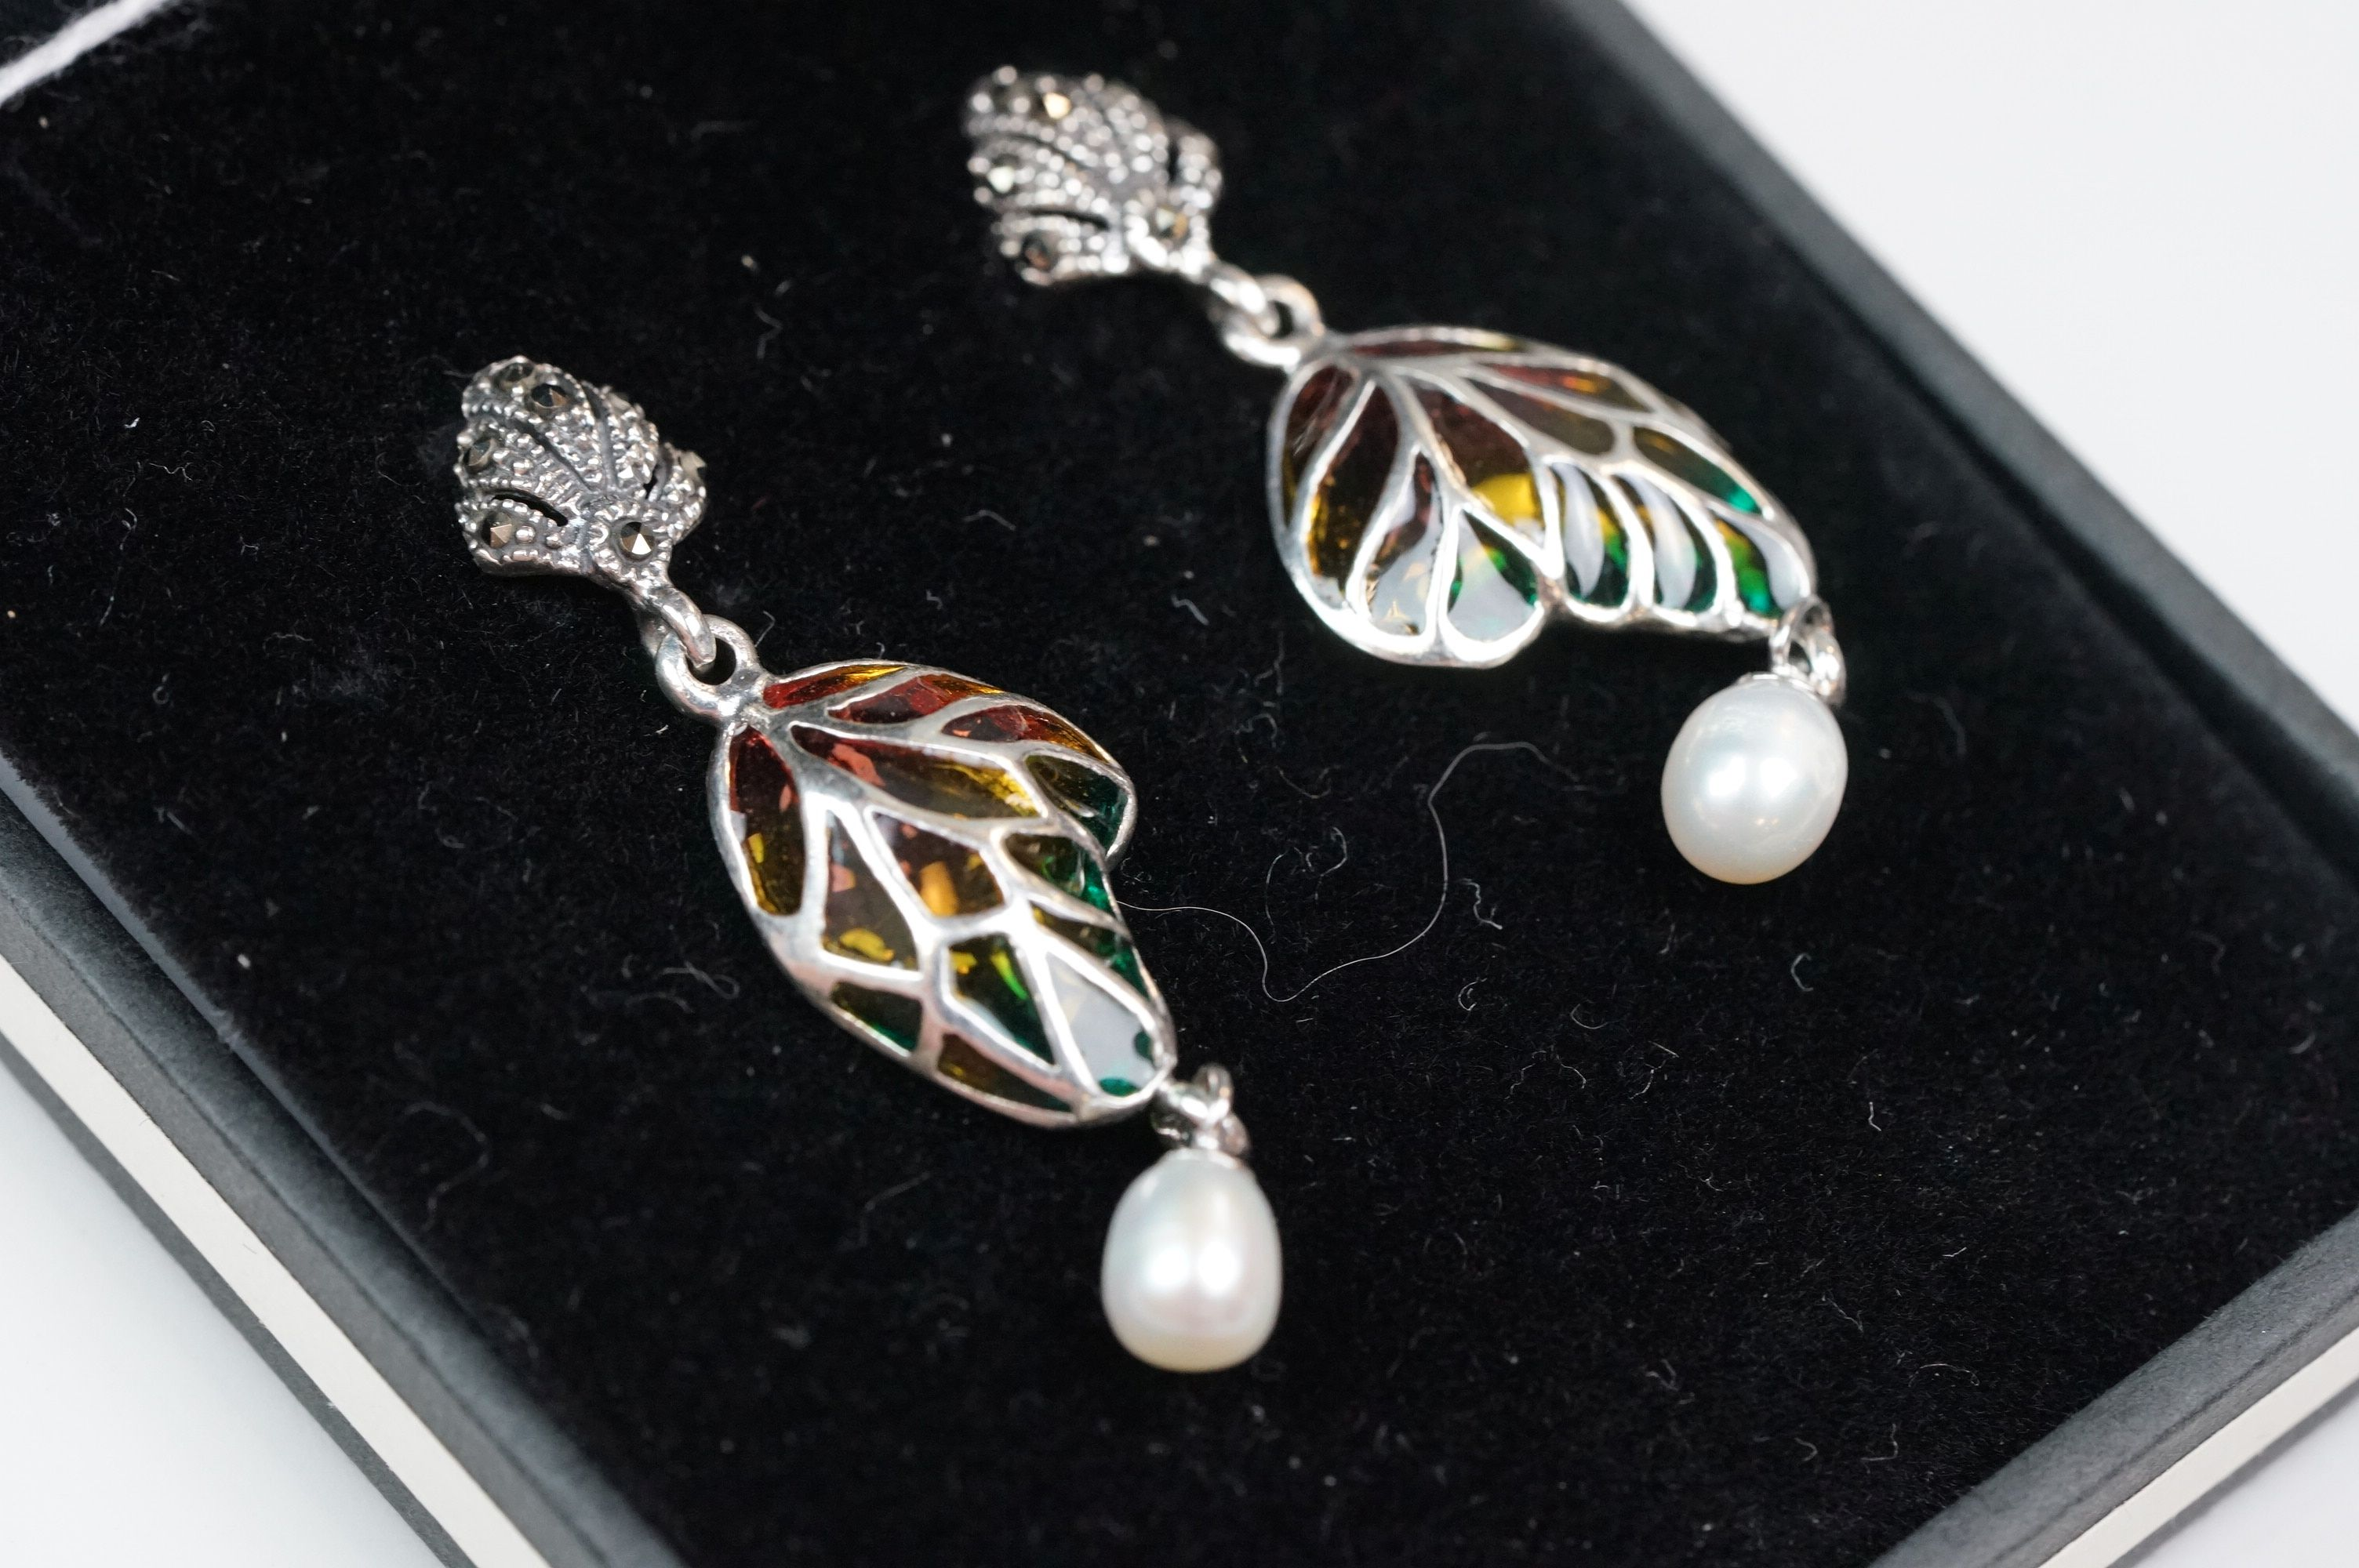 Pair of silver plique-a-jour drop earrings